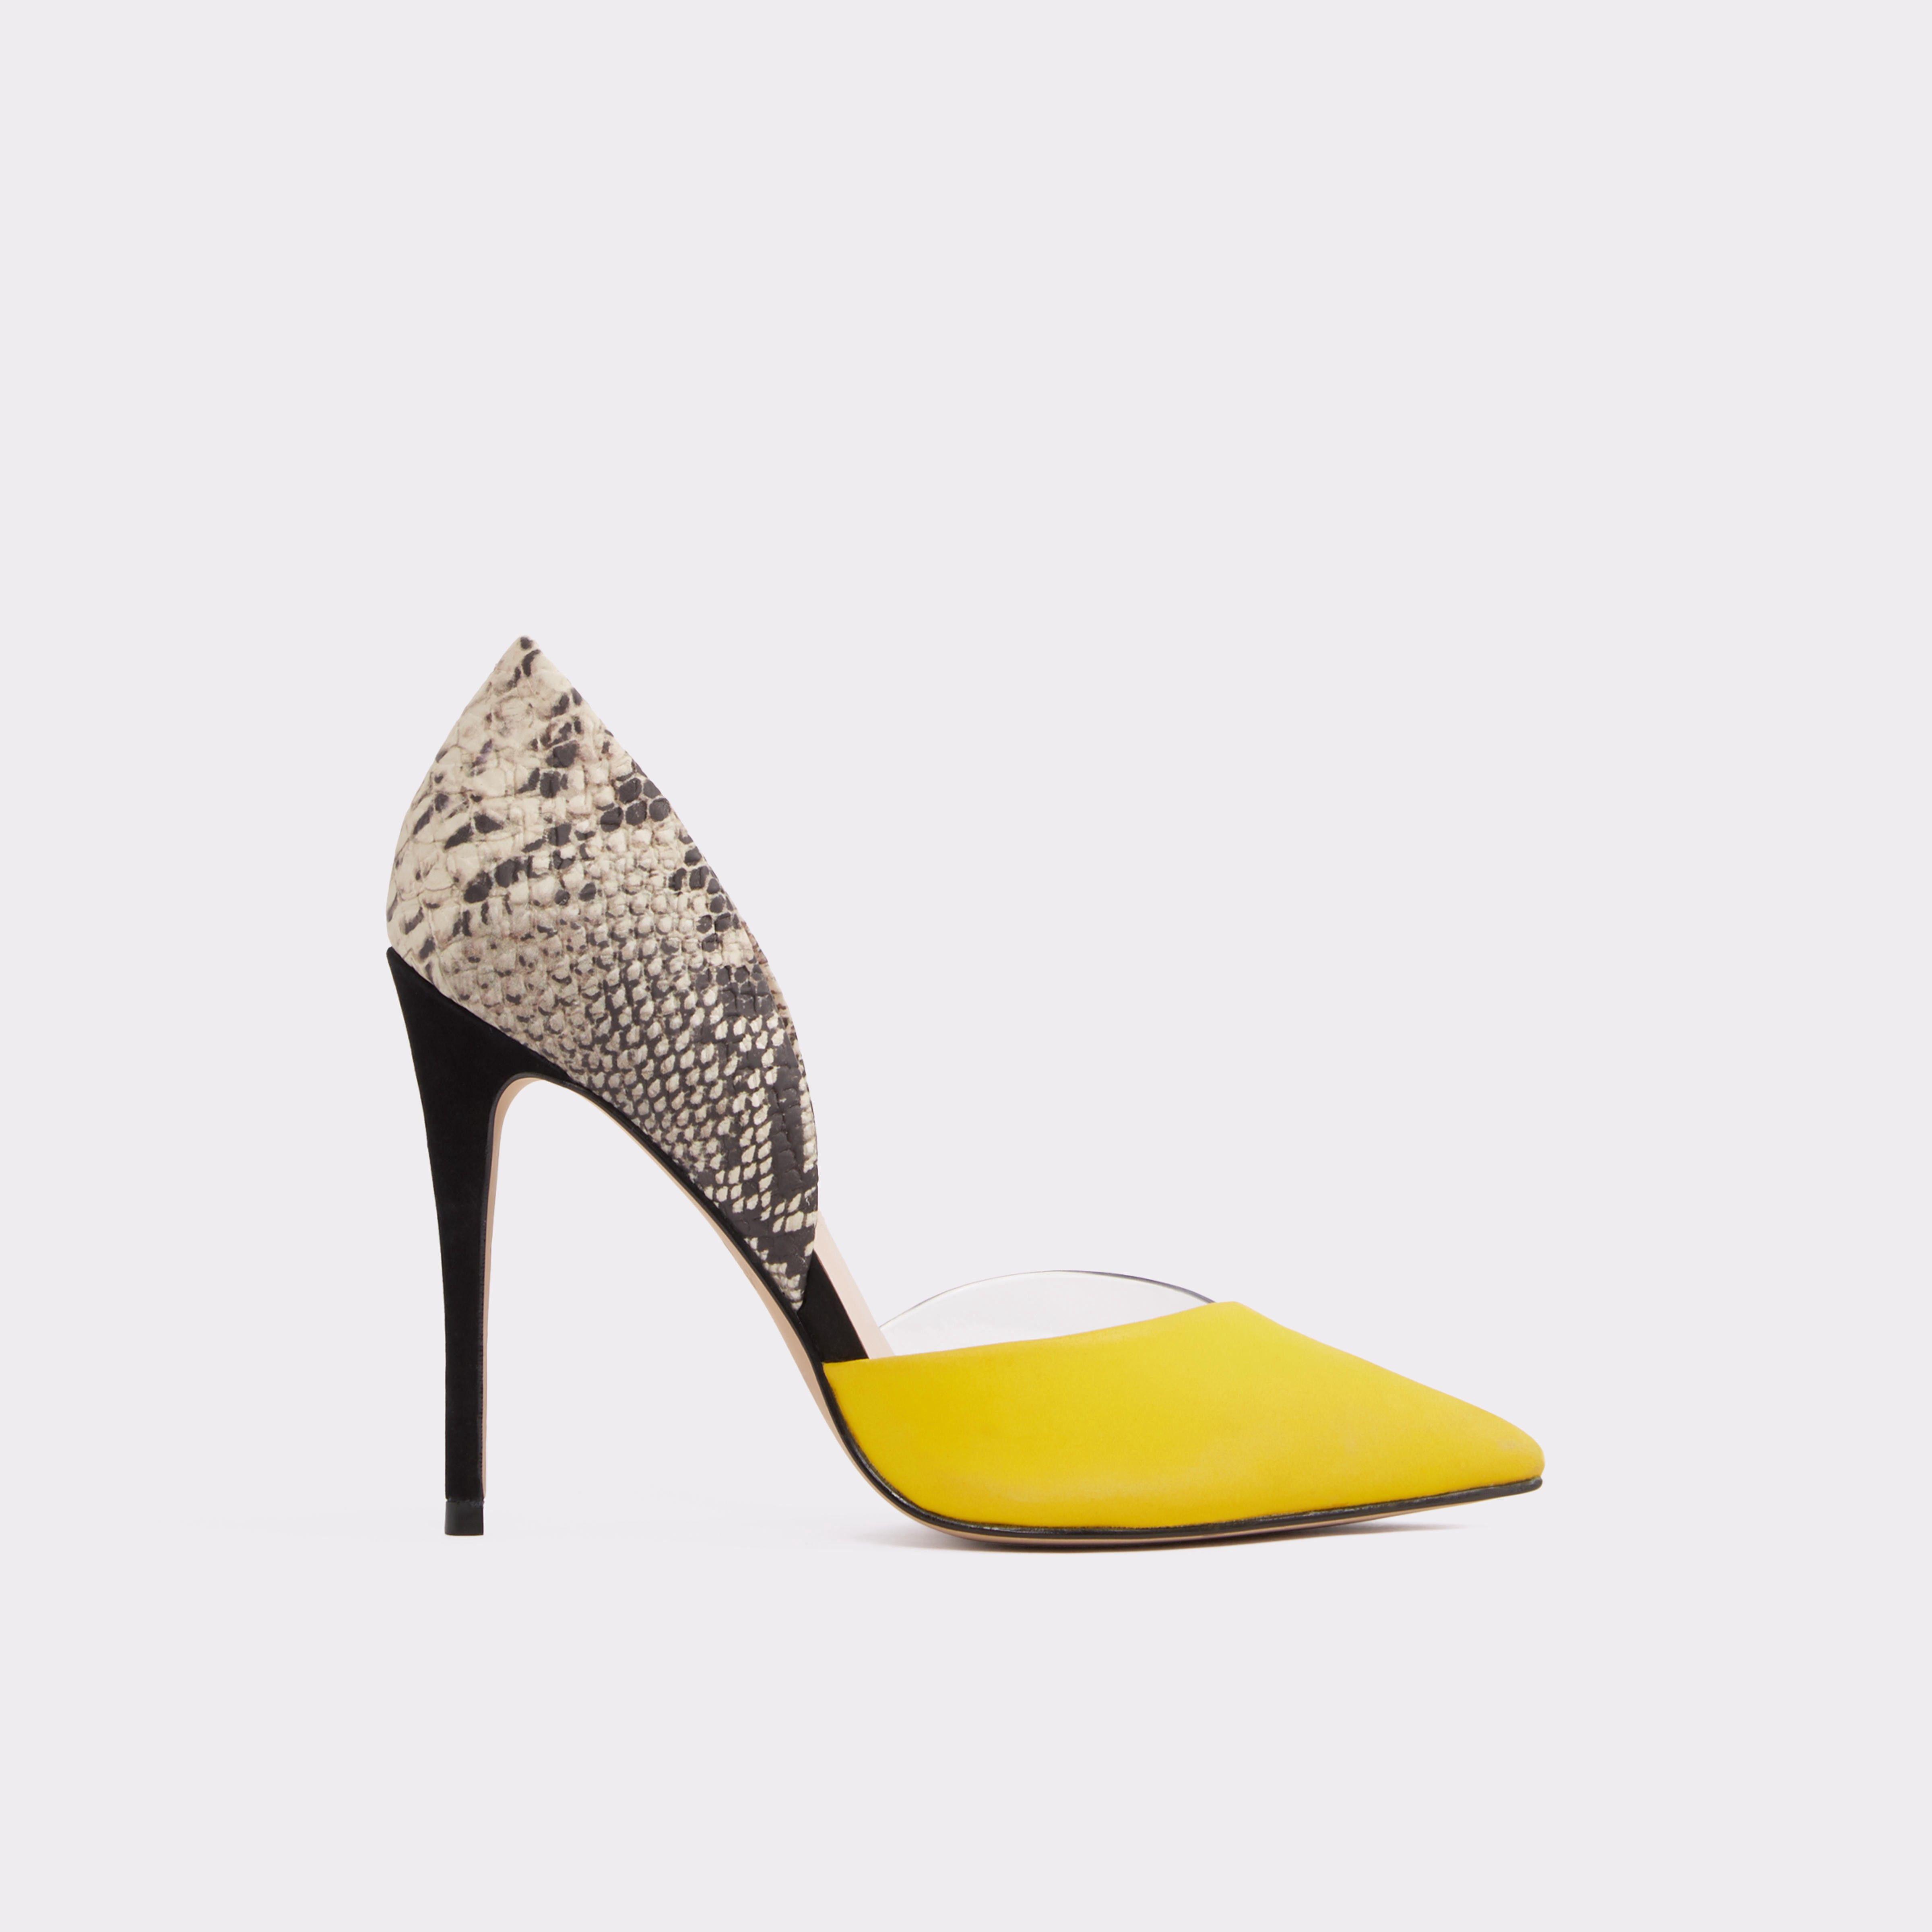 4ad5984e1 Aldo Legiralia - Mustard 8.5. Aldo Legiralia - Mustard 6.5 Yellow Shoes  Heels ...